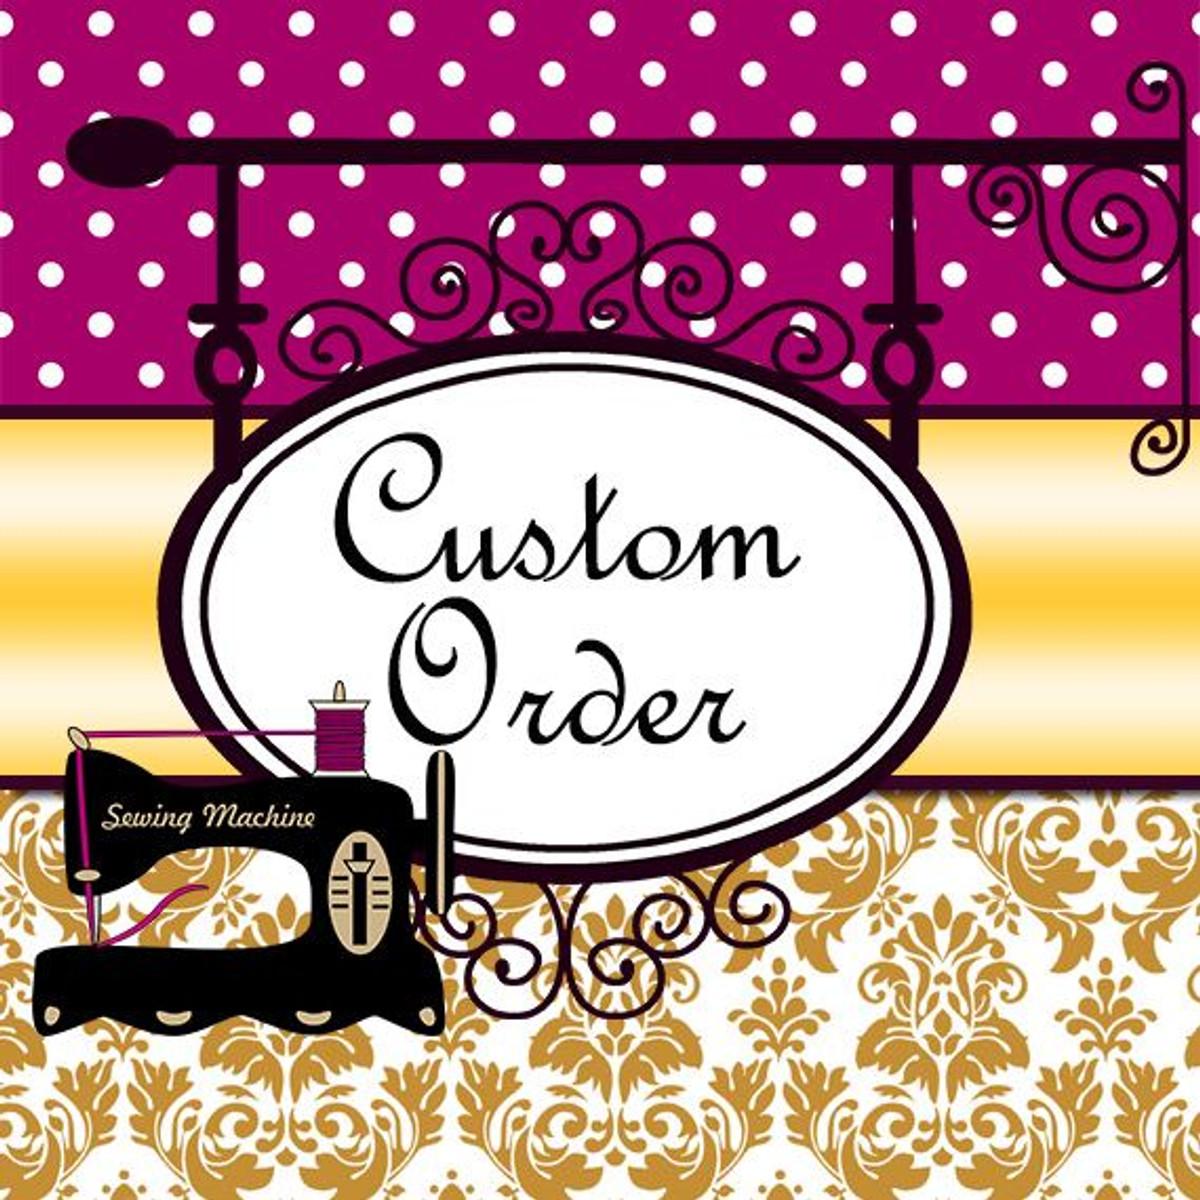 Copy of Custom Wedding Dress for Marcia V